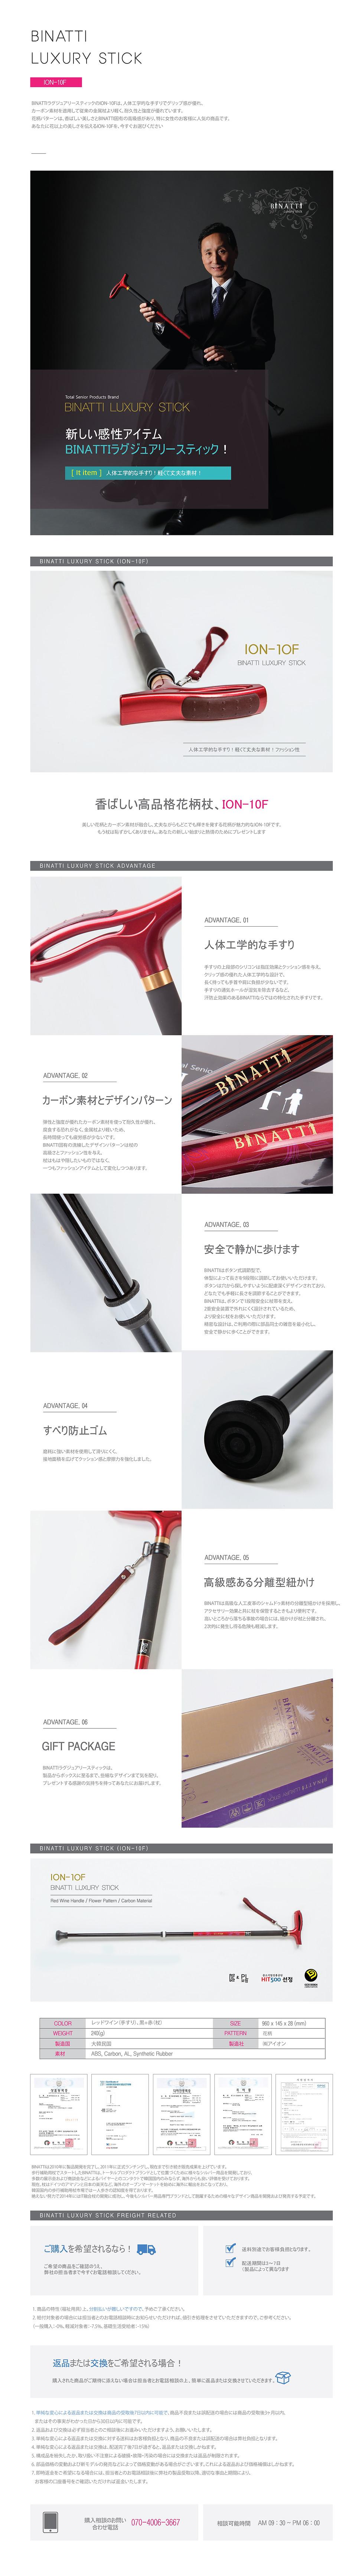 [JP]ION-10F-01.jpg